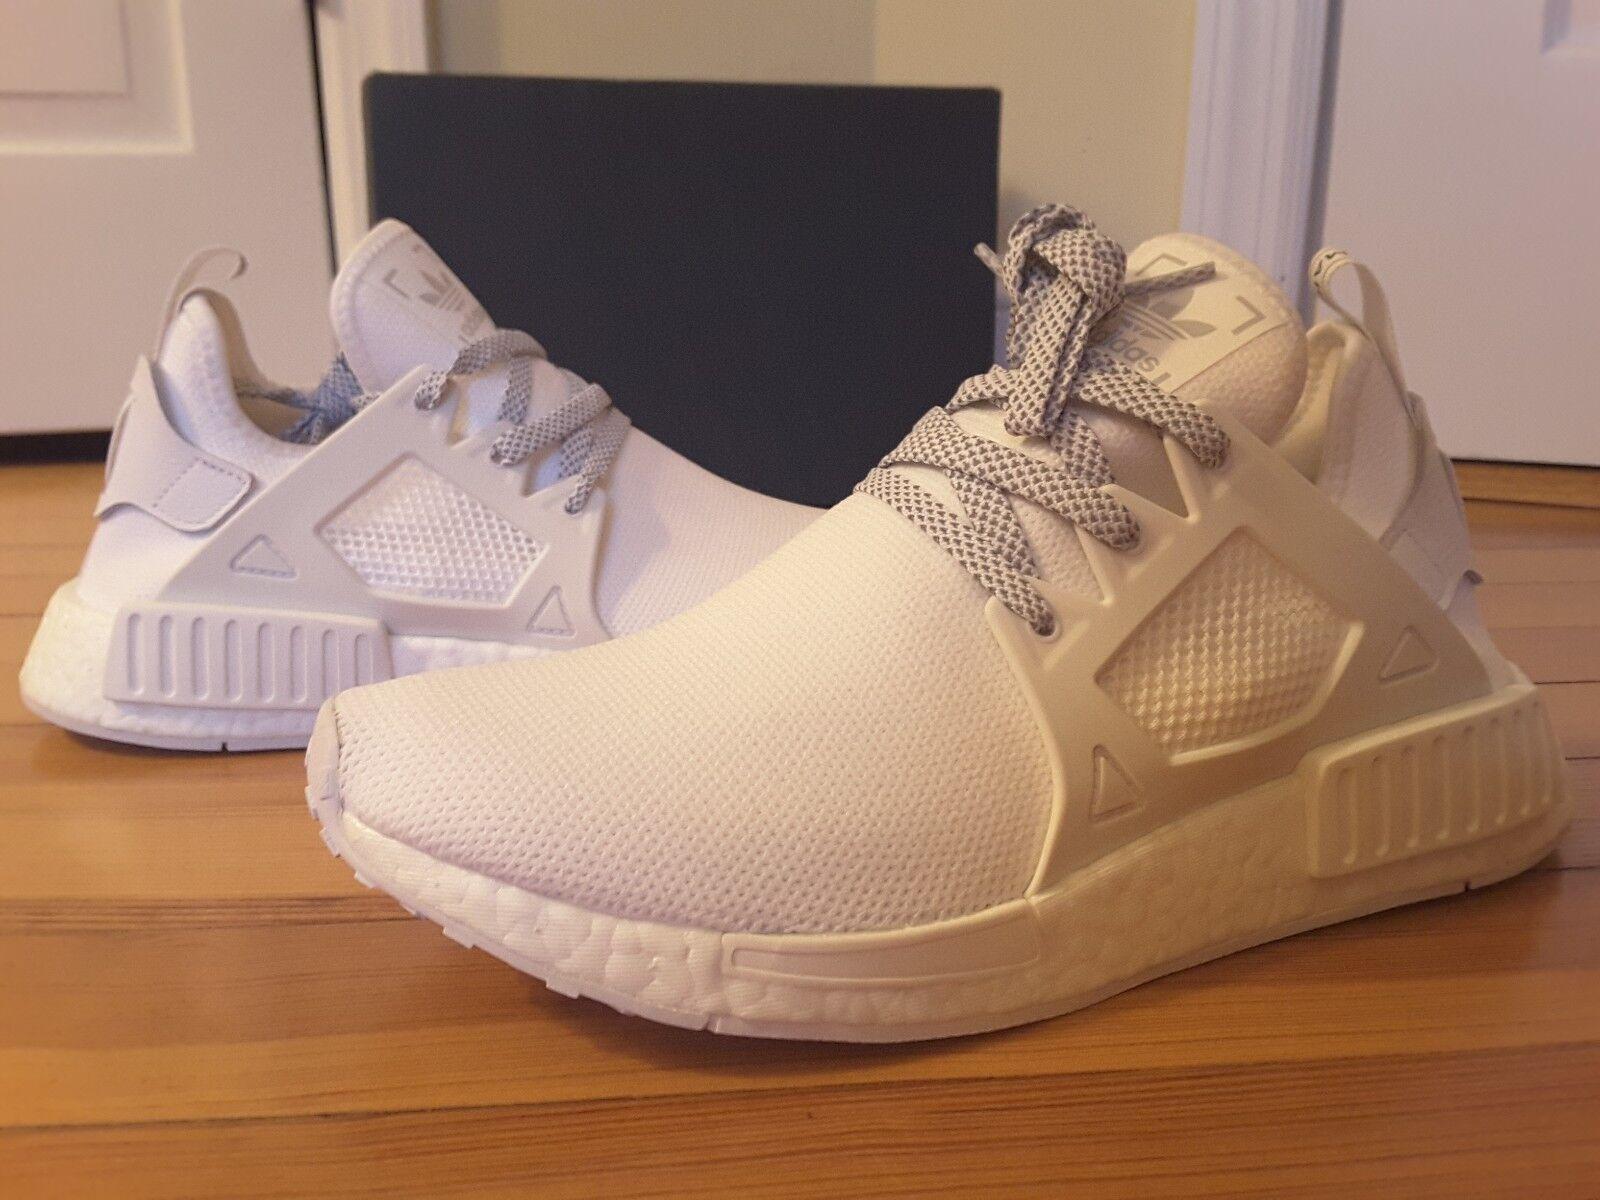 New Adidas NMD_XR1 Triple White BY3052 Europe Footlocker Exclusive NMD XR1 Mens